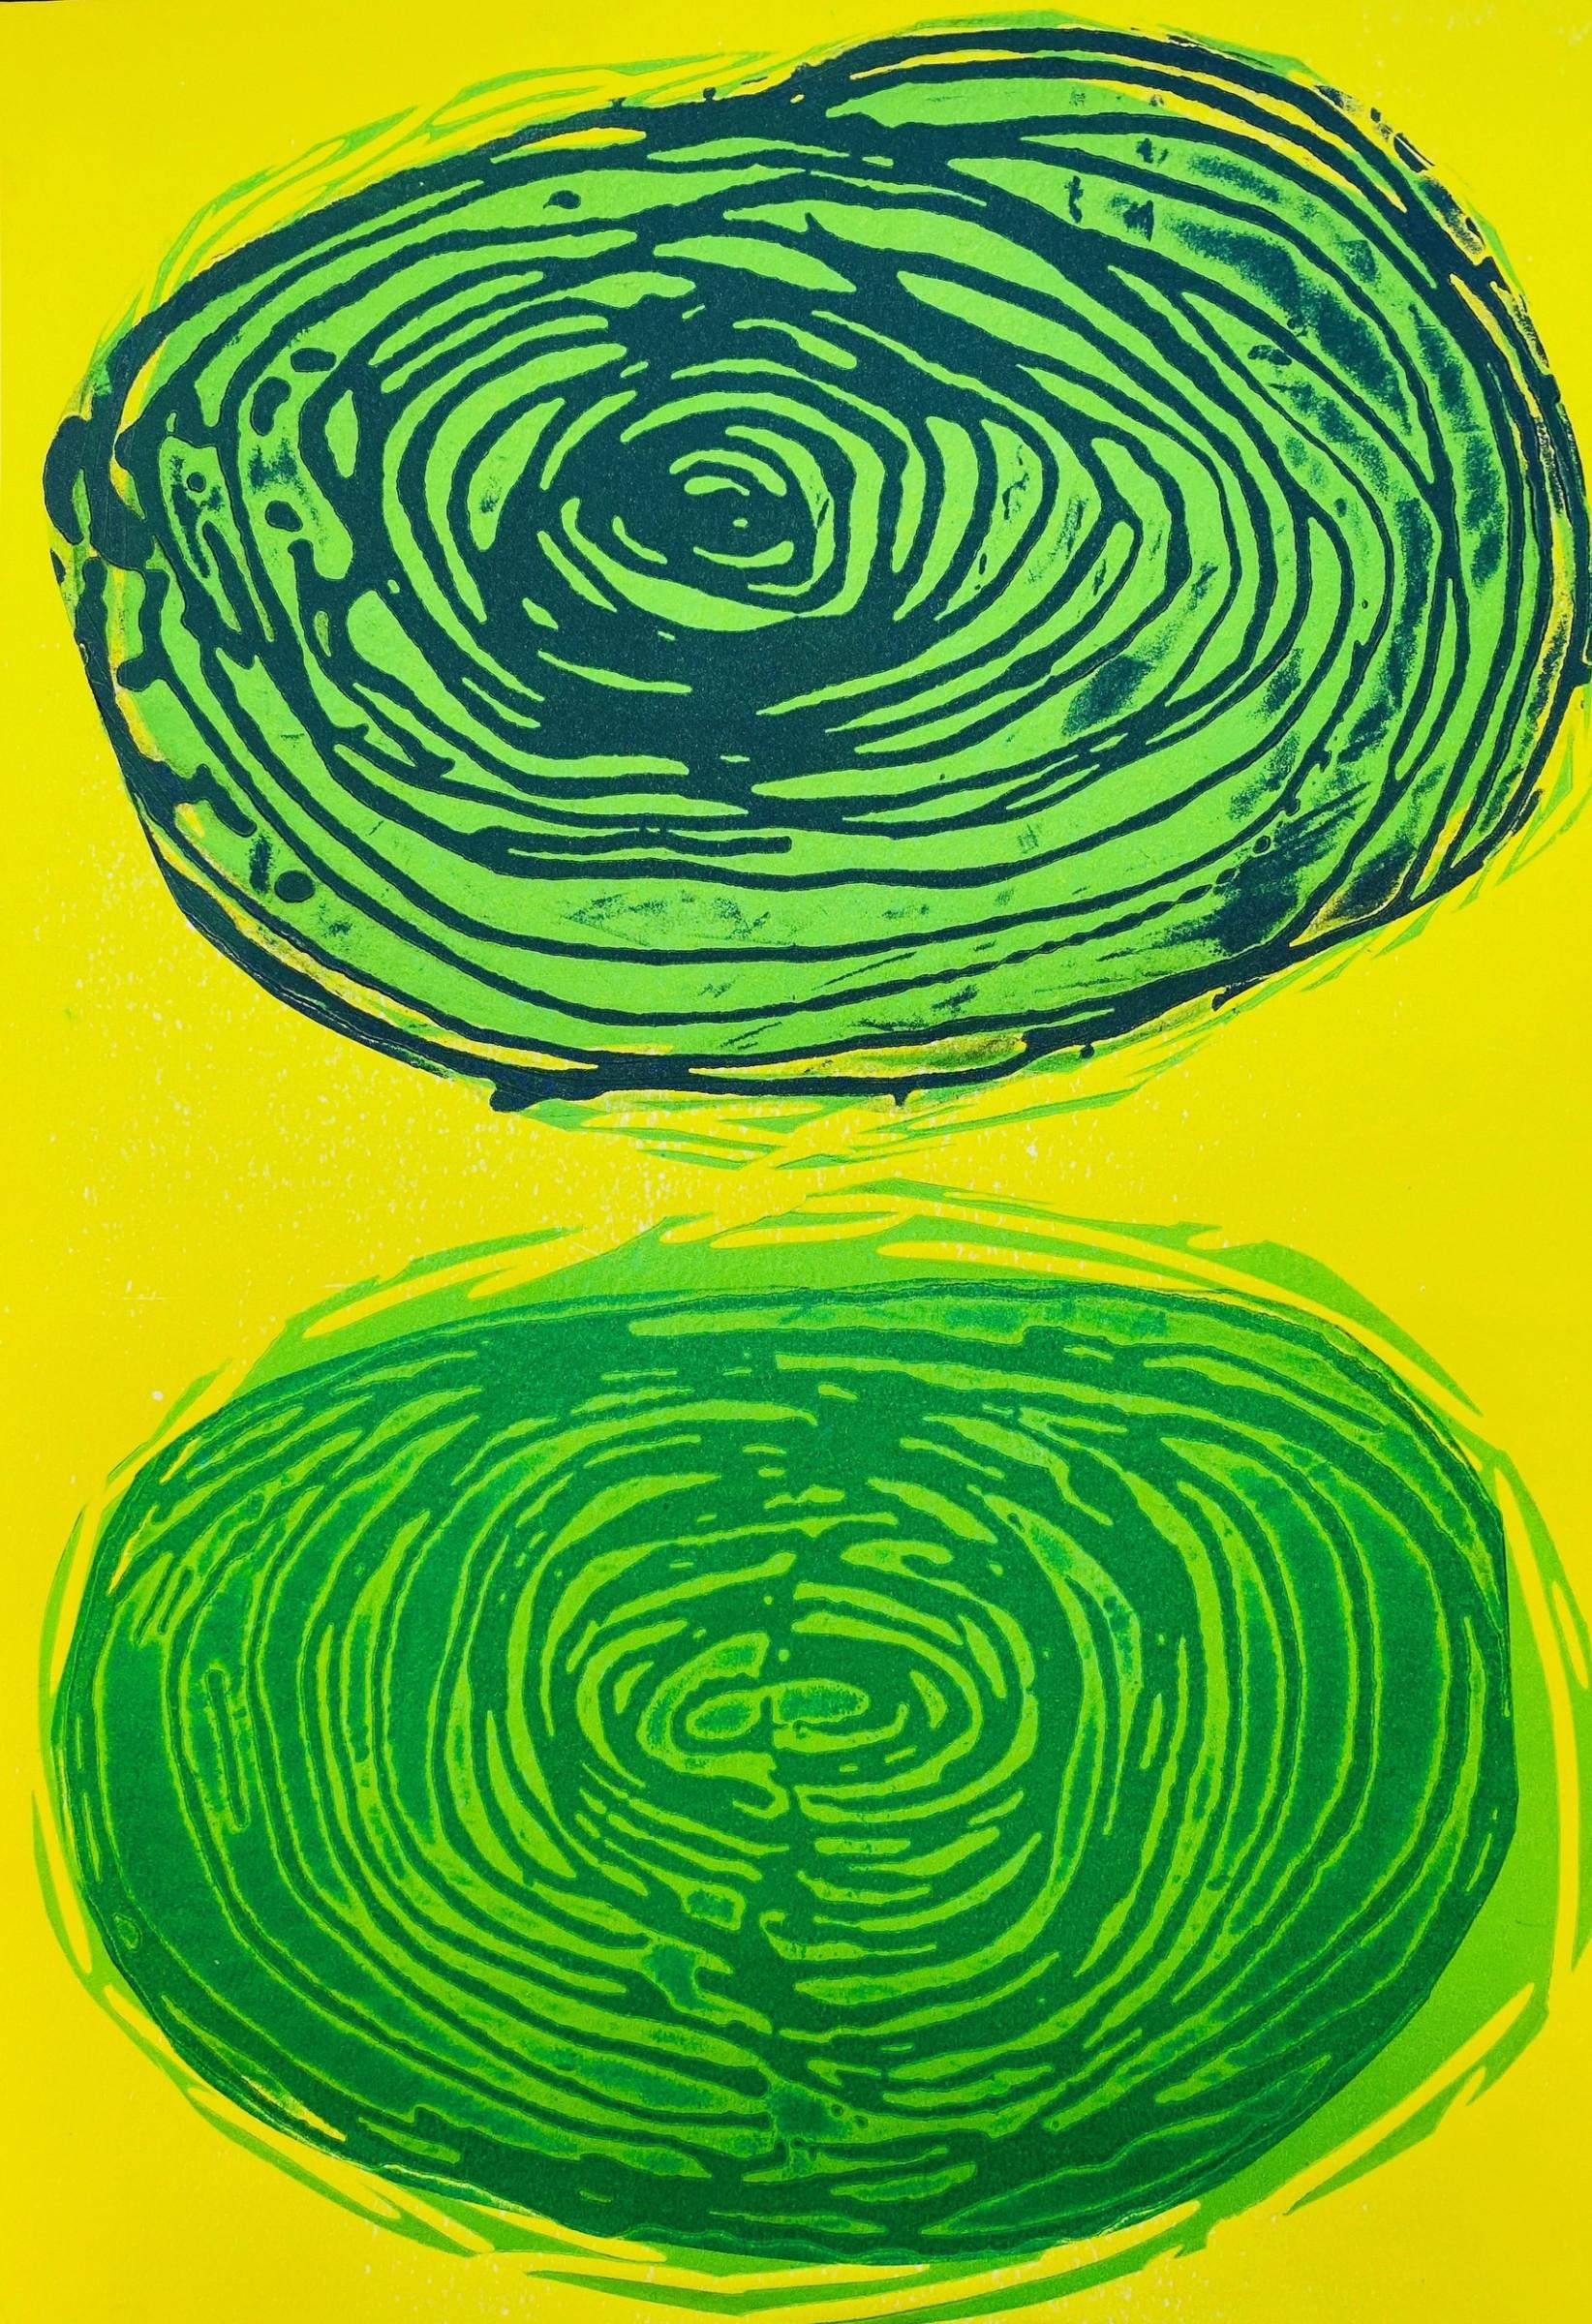 "<span class=""link fancybox-details-link""><a href=""/exhibitions/20/works/artworks_standalone10778/"">View Detail Page</a></span><div class=""artist""><span class=""artist""><strong>Howard Jeffs RE</strong></span></div><div class=""title""><em>Two Whirls No 3</em></div><div class=""medium"">etched lino</div><div class=""dimensions"">56 x 37cm</div><div class=""edition_details"">edition of 5</div>"